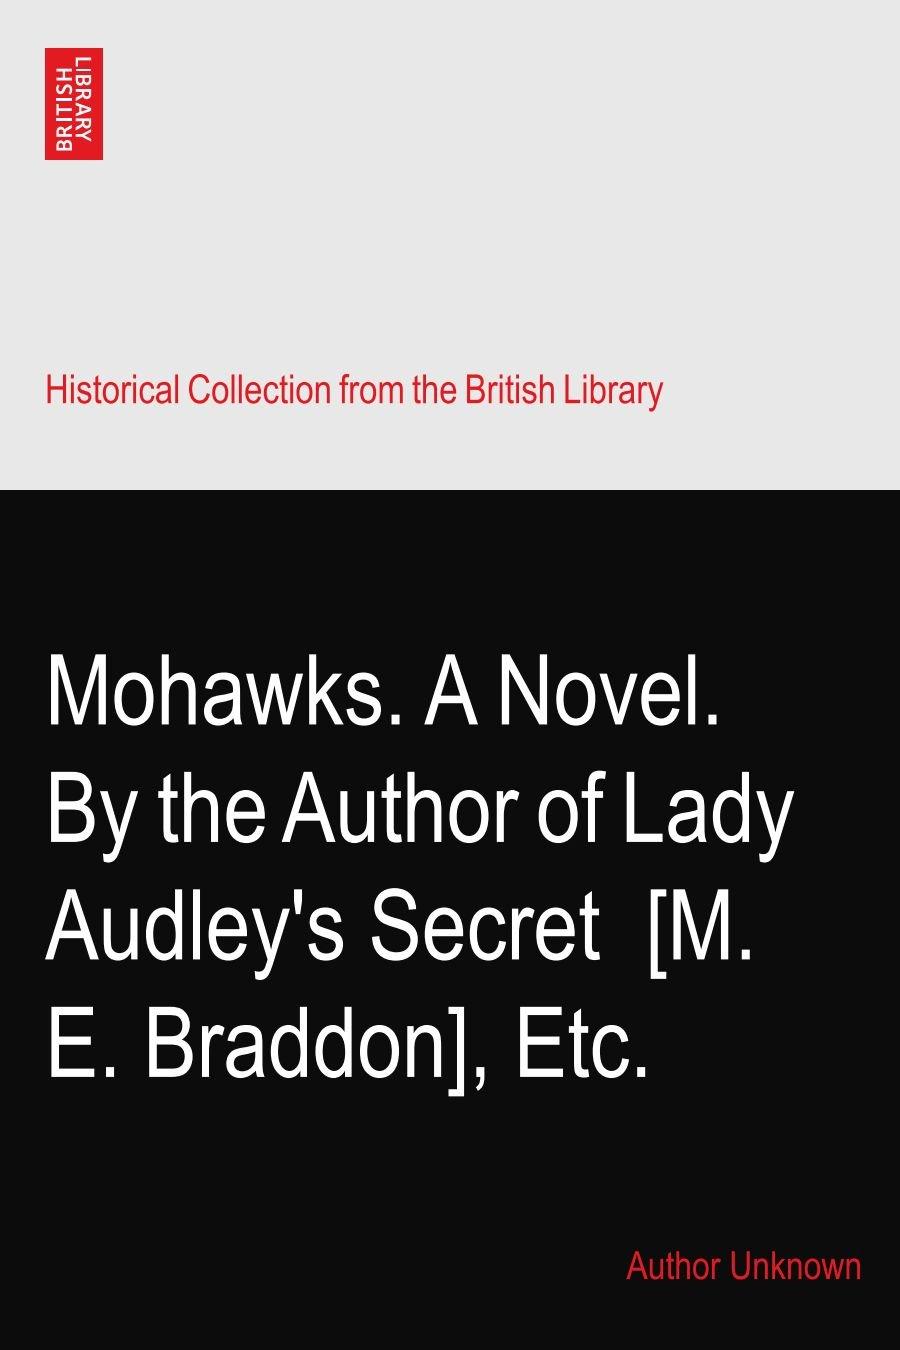 Mohawks. A Novel. By the Author of Lady Audley's Secret? [M. E. Braddon], Etc. PDF